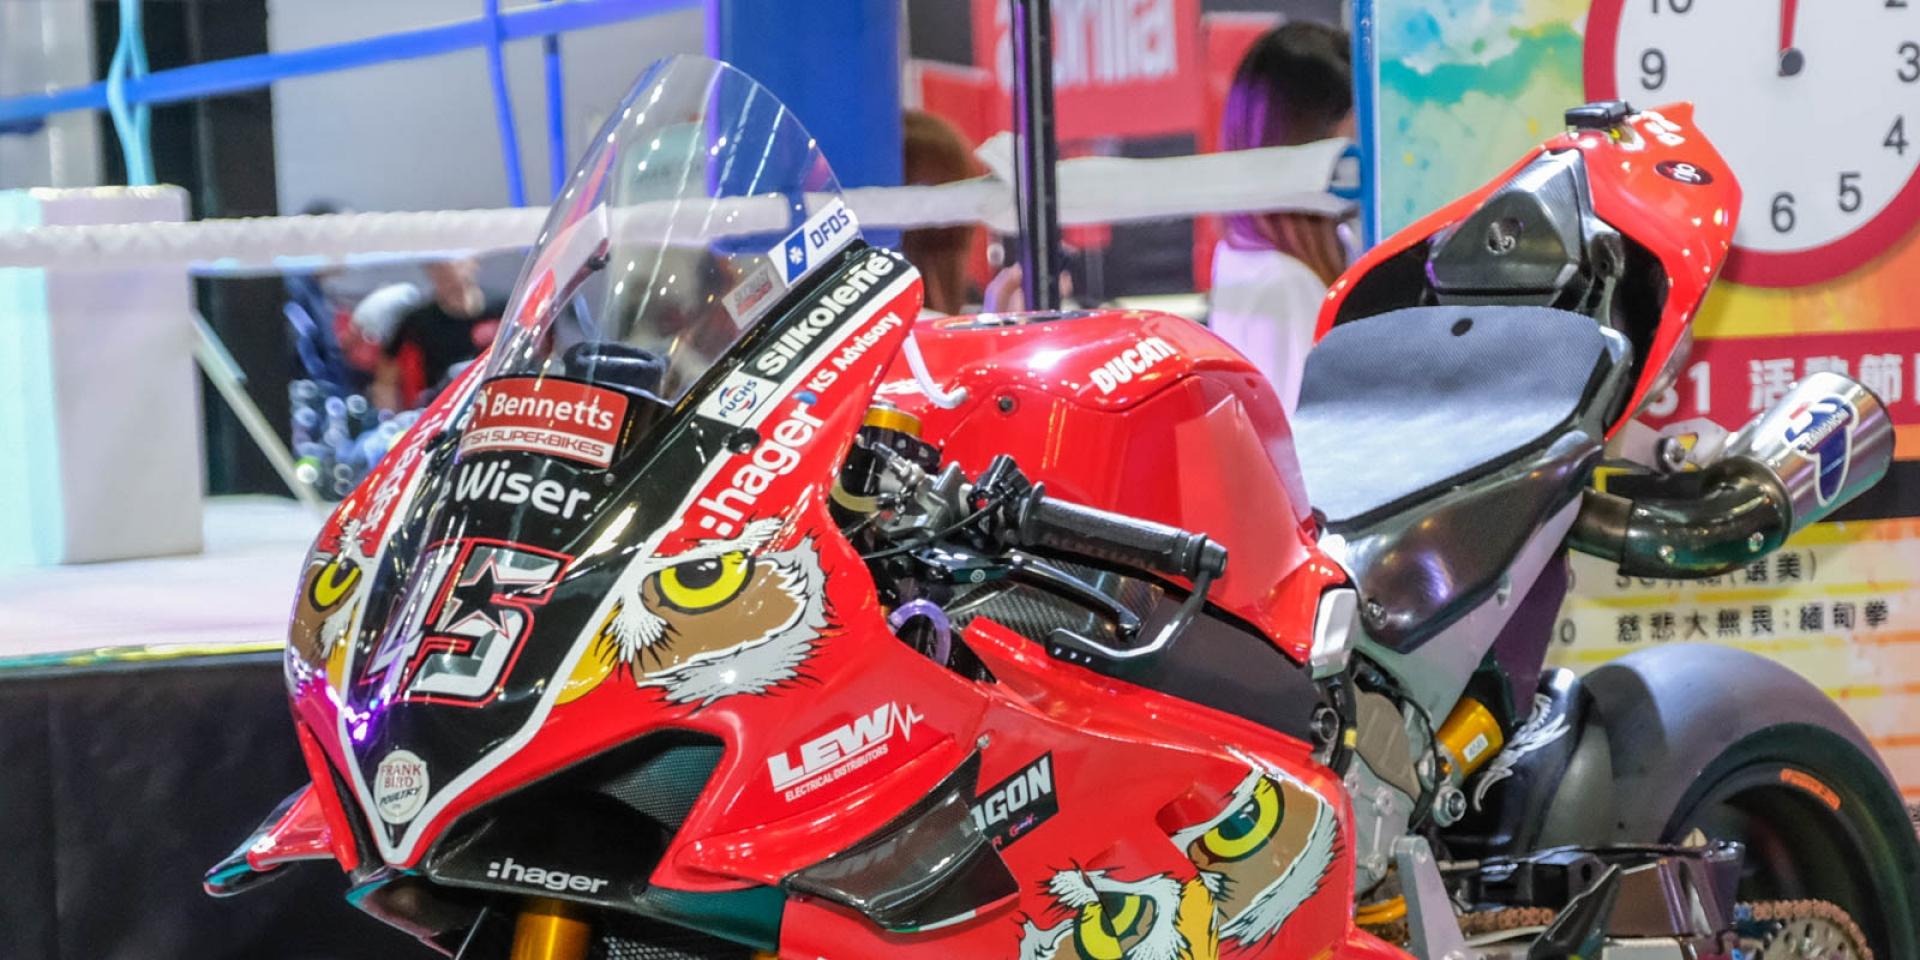 SHOEI X14 6折起出清、BSB冠軍Ducati V4R廠車展示 台機2勢力週末登場